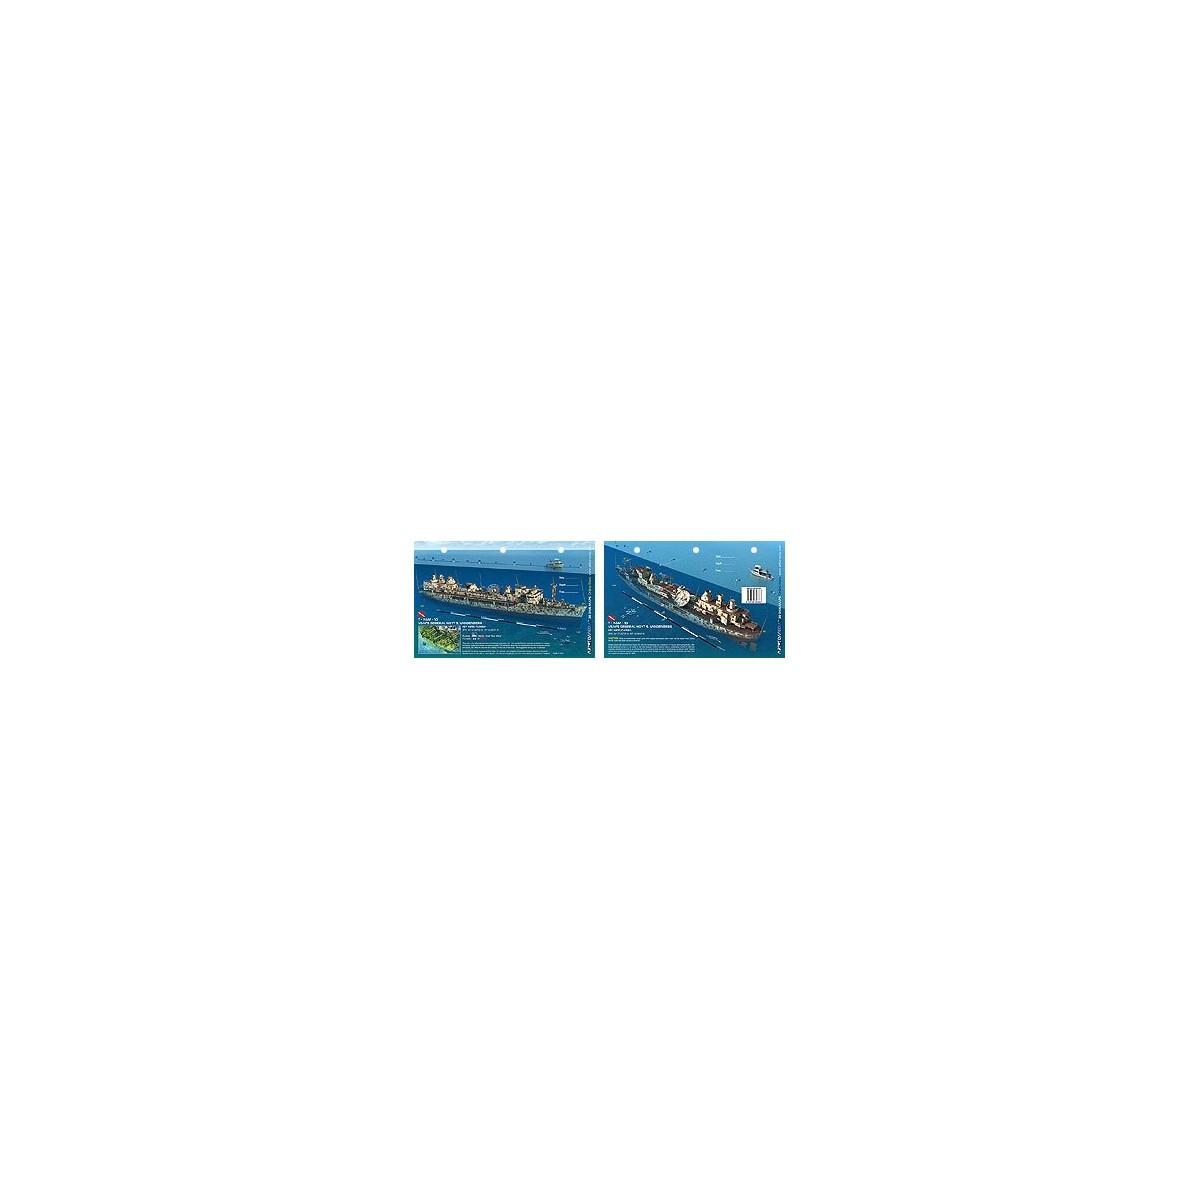 Vandenberg in Key West, Florida (8.5 x 5.5 Inches) (21.6 x 15cm) - New Art to Media Underwater Waterproof 3D Dive Site Map